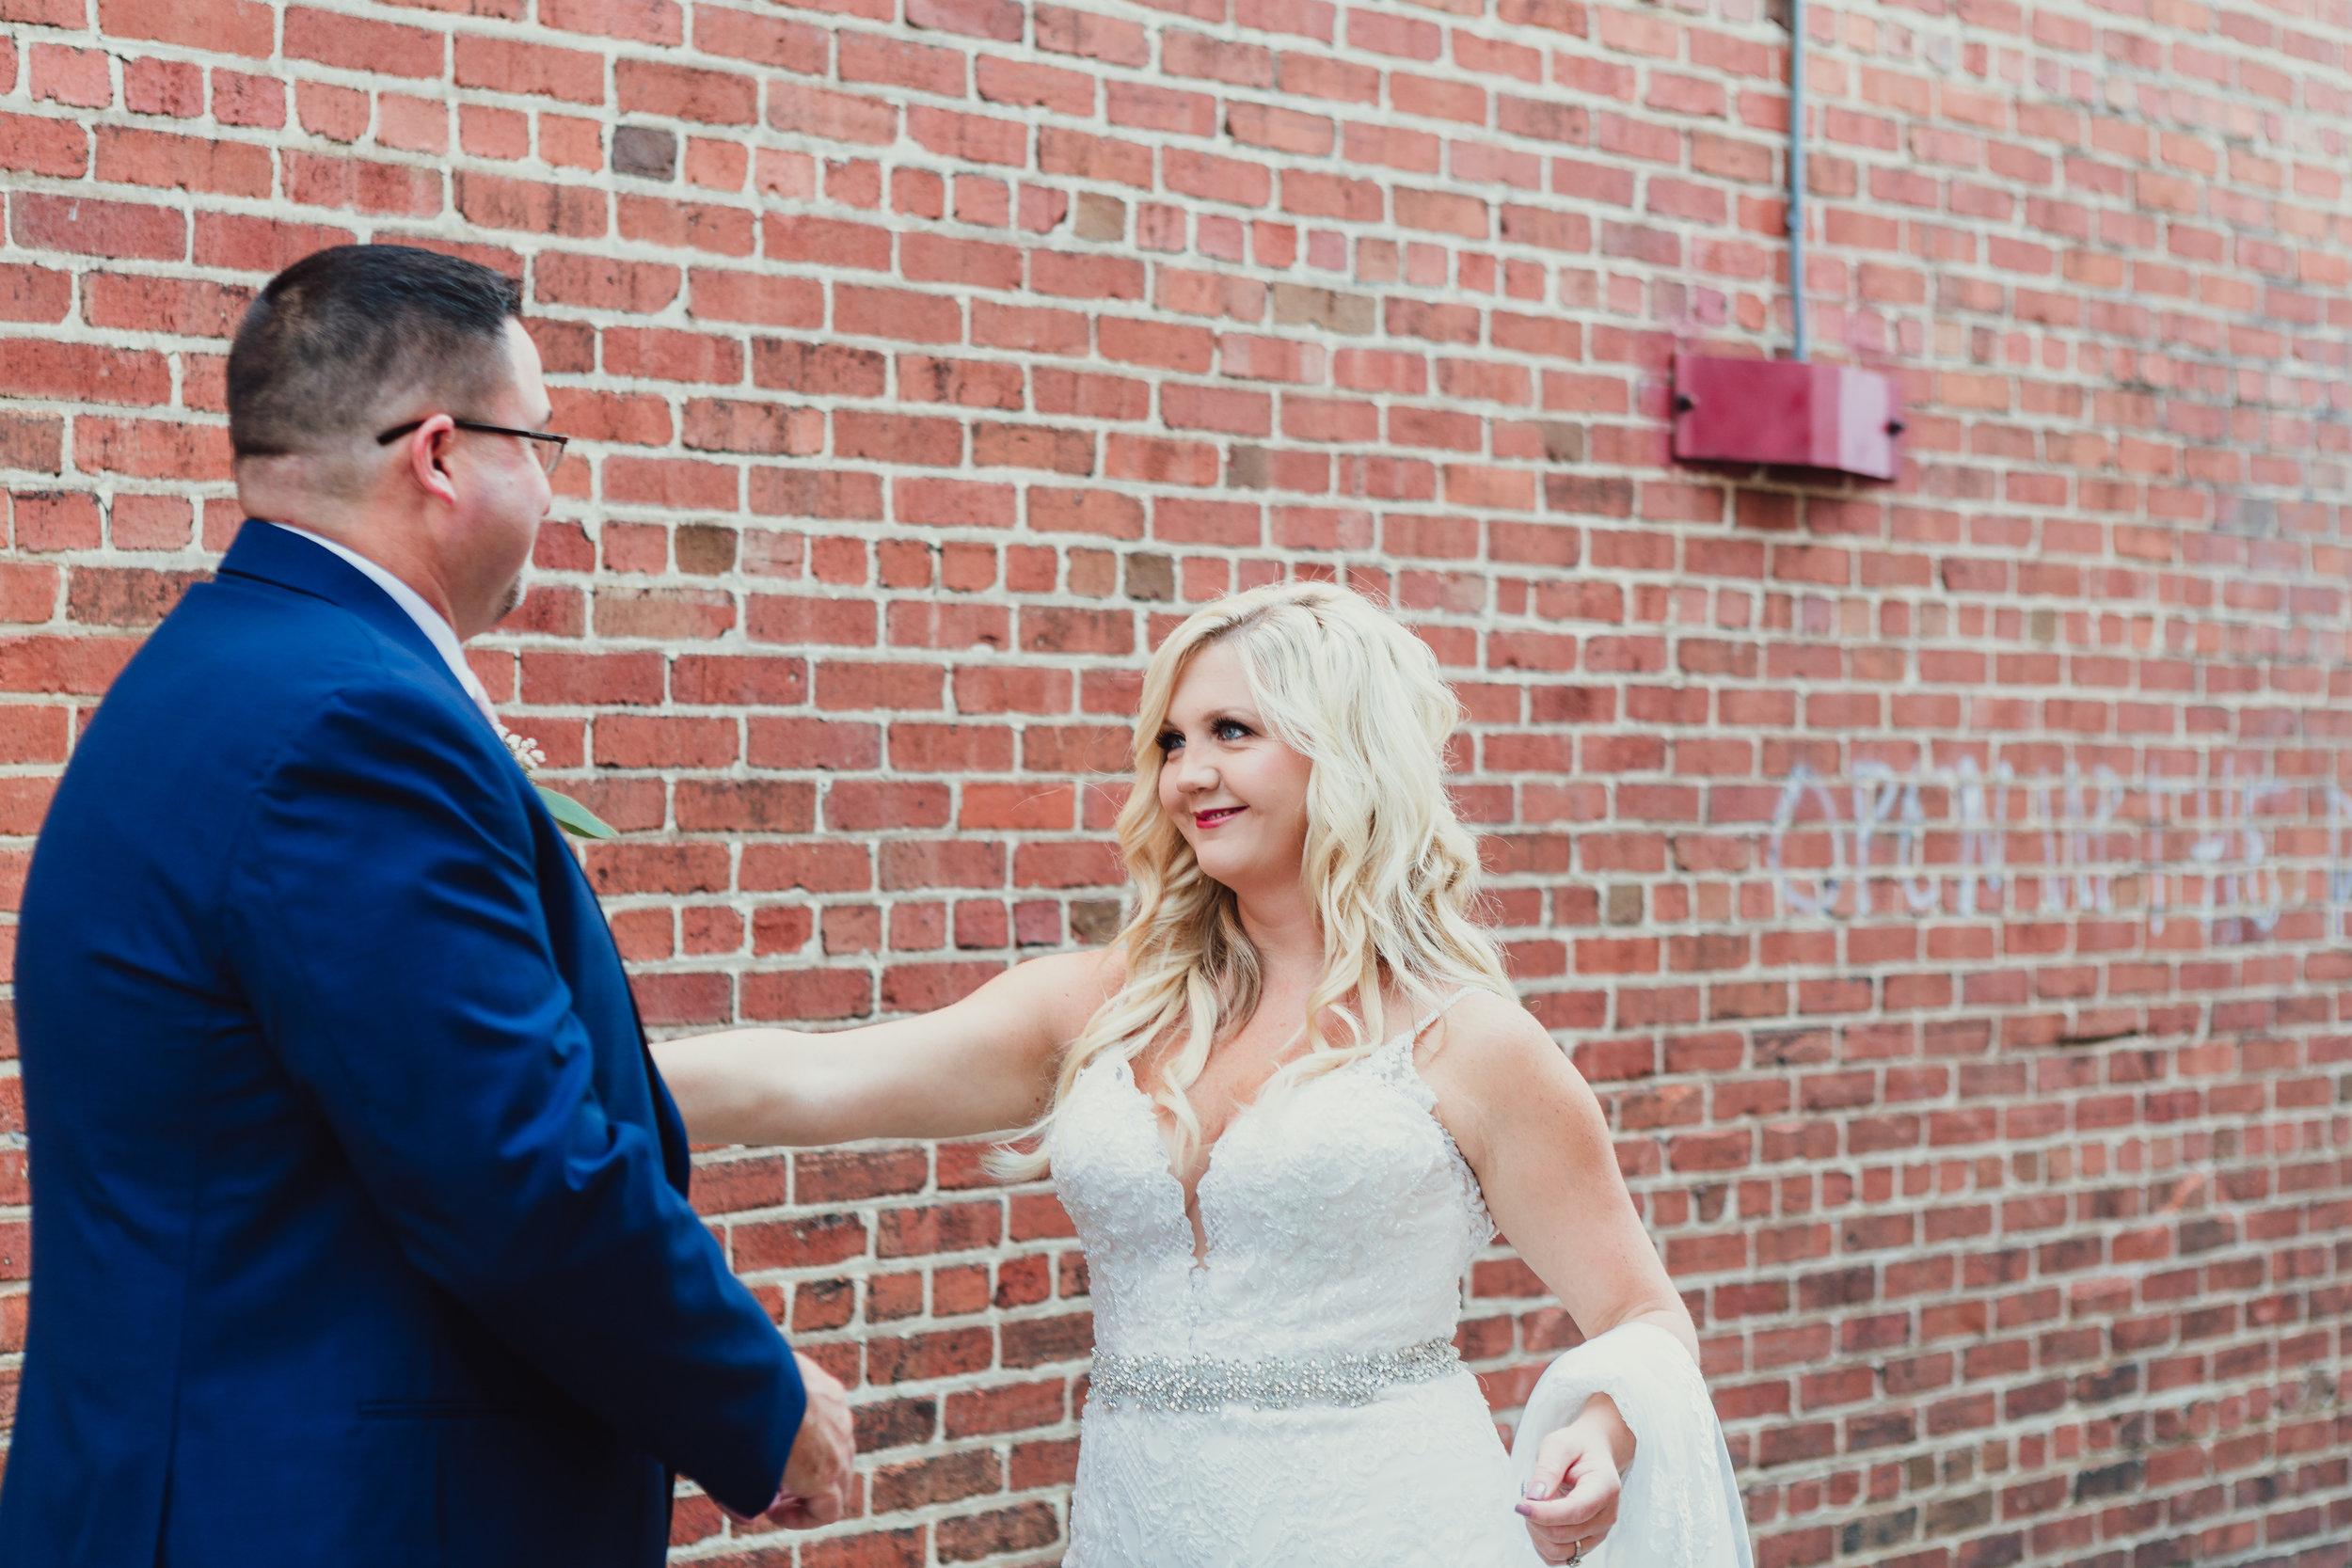 east-tn-wedding-photographer-tennessee-elopement-photographer-kingsport-tn-wedding-photographer (351 of 1001).jpg